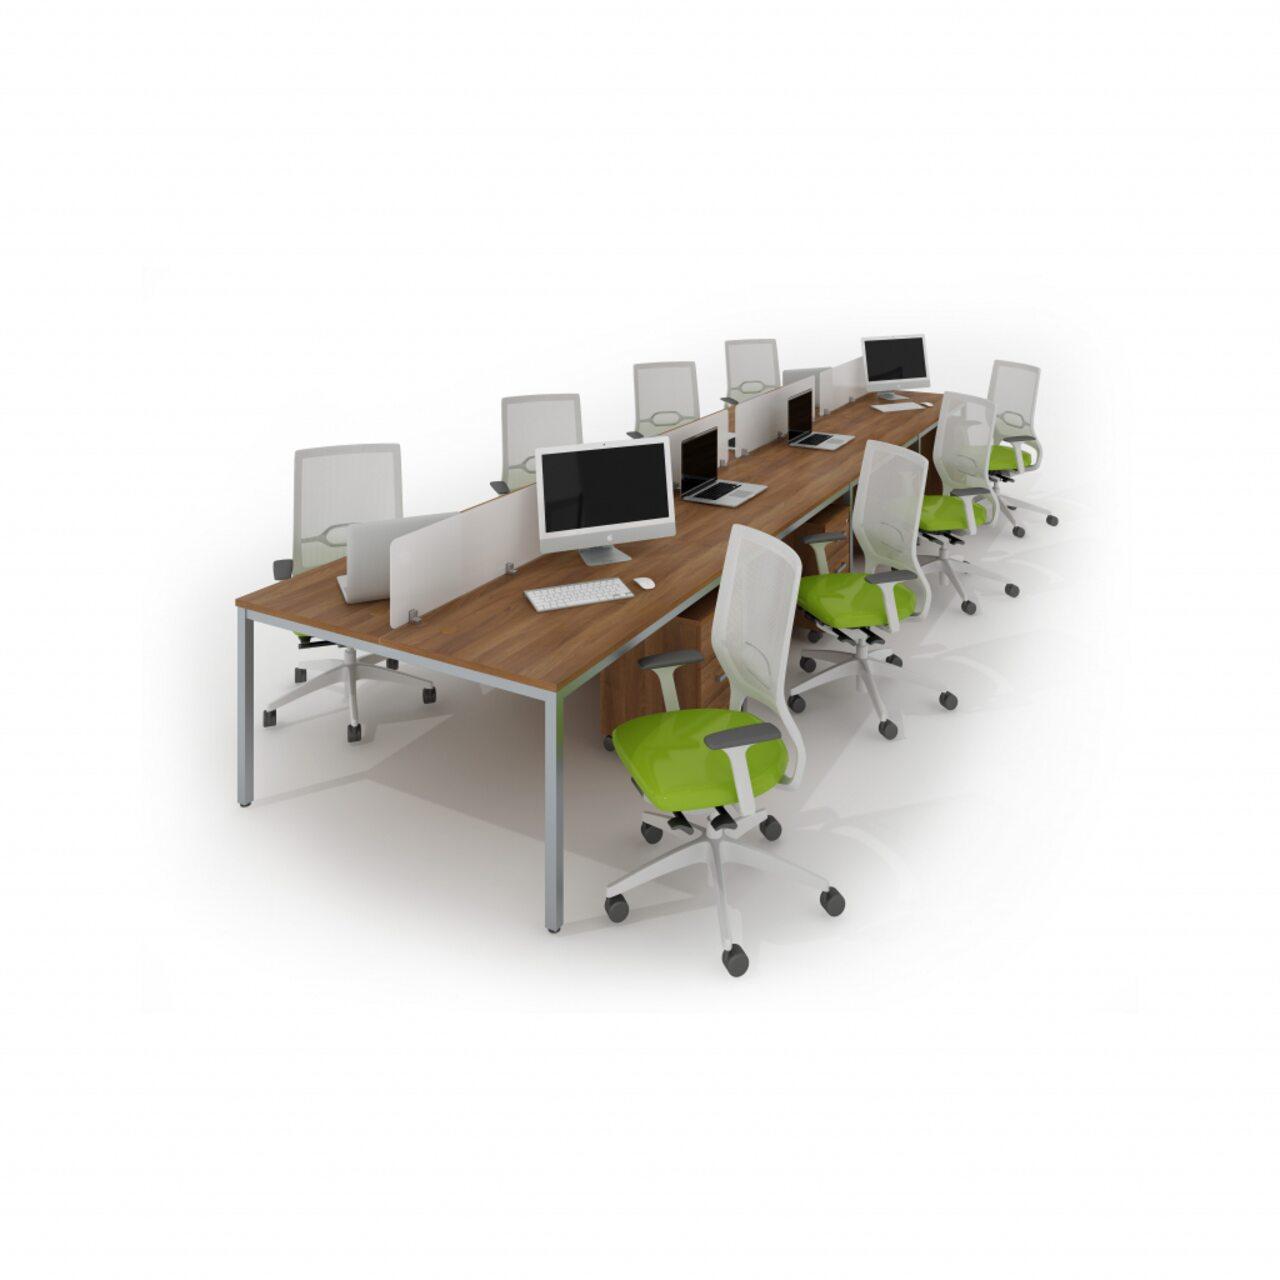 Мебель для персонала Avance - фото 6